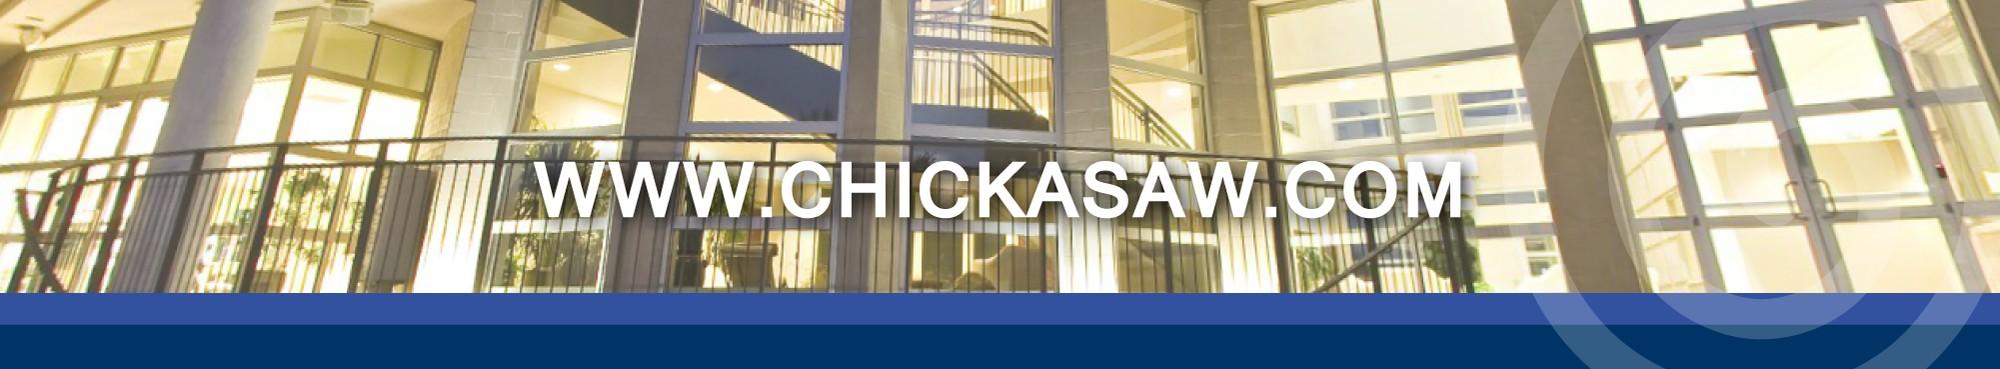 Chickasaw Nation Industries, Inc    LinkedIn